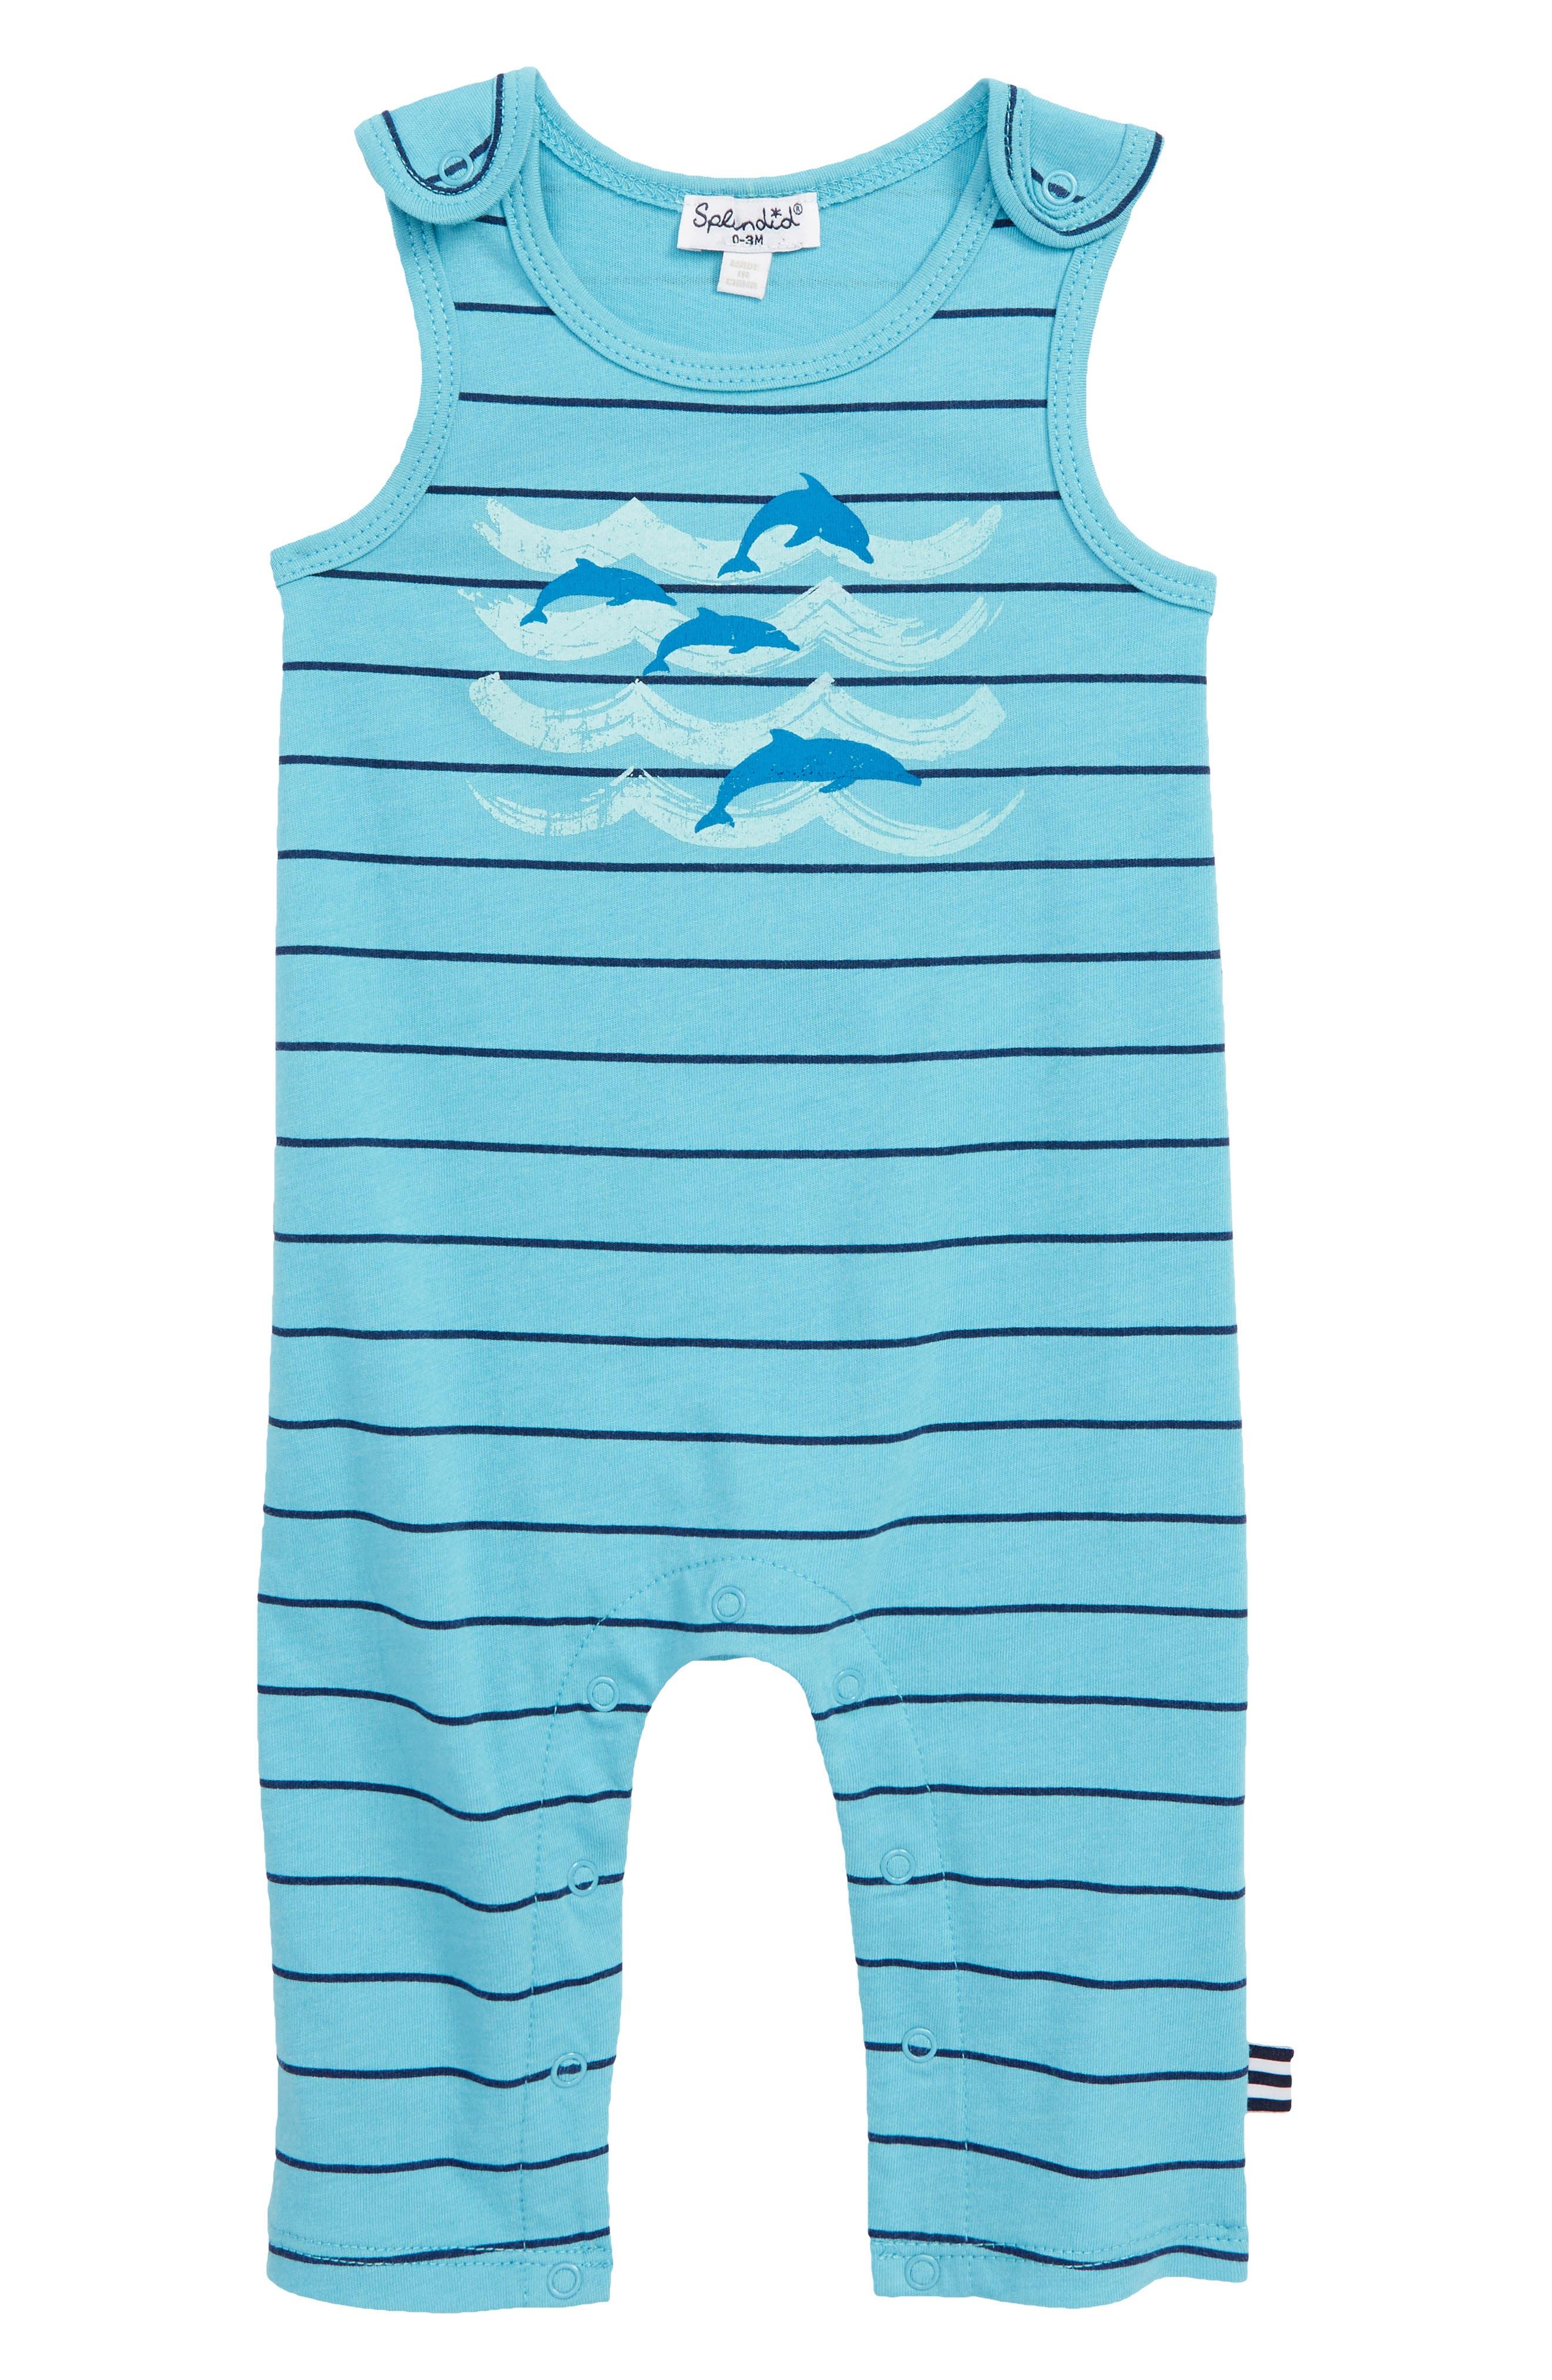 Dolphin Stripe Romper,                             Main thumbnail 1, color,                             Maui Blue Stripe